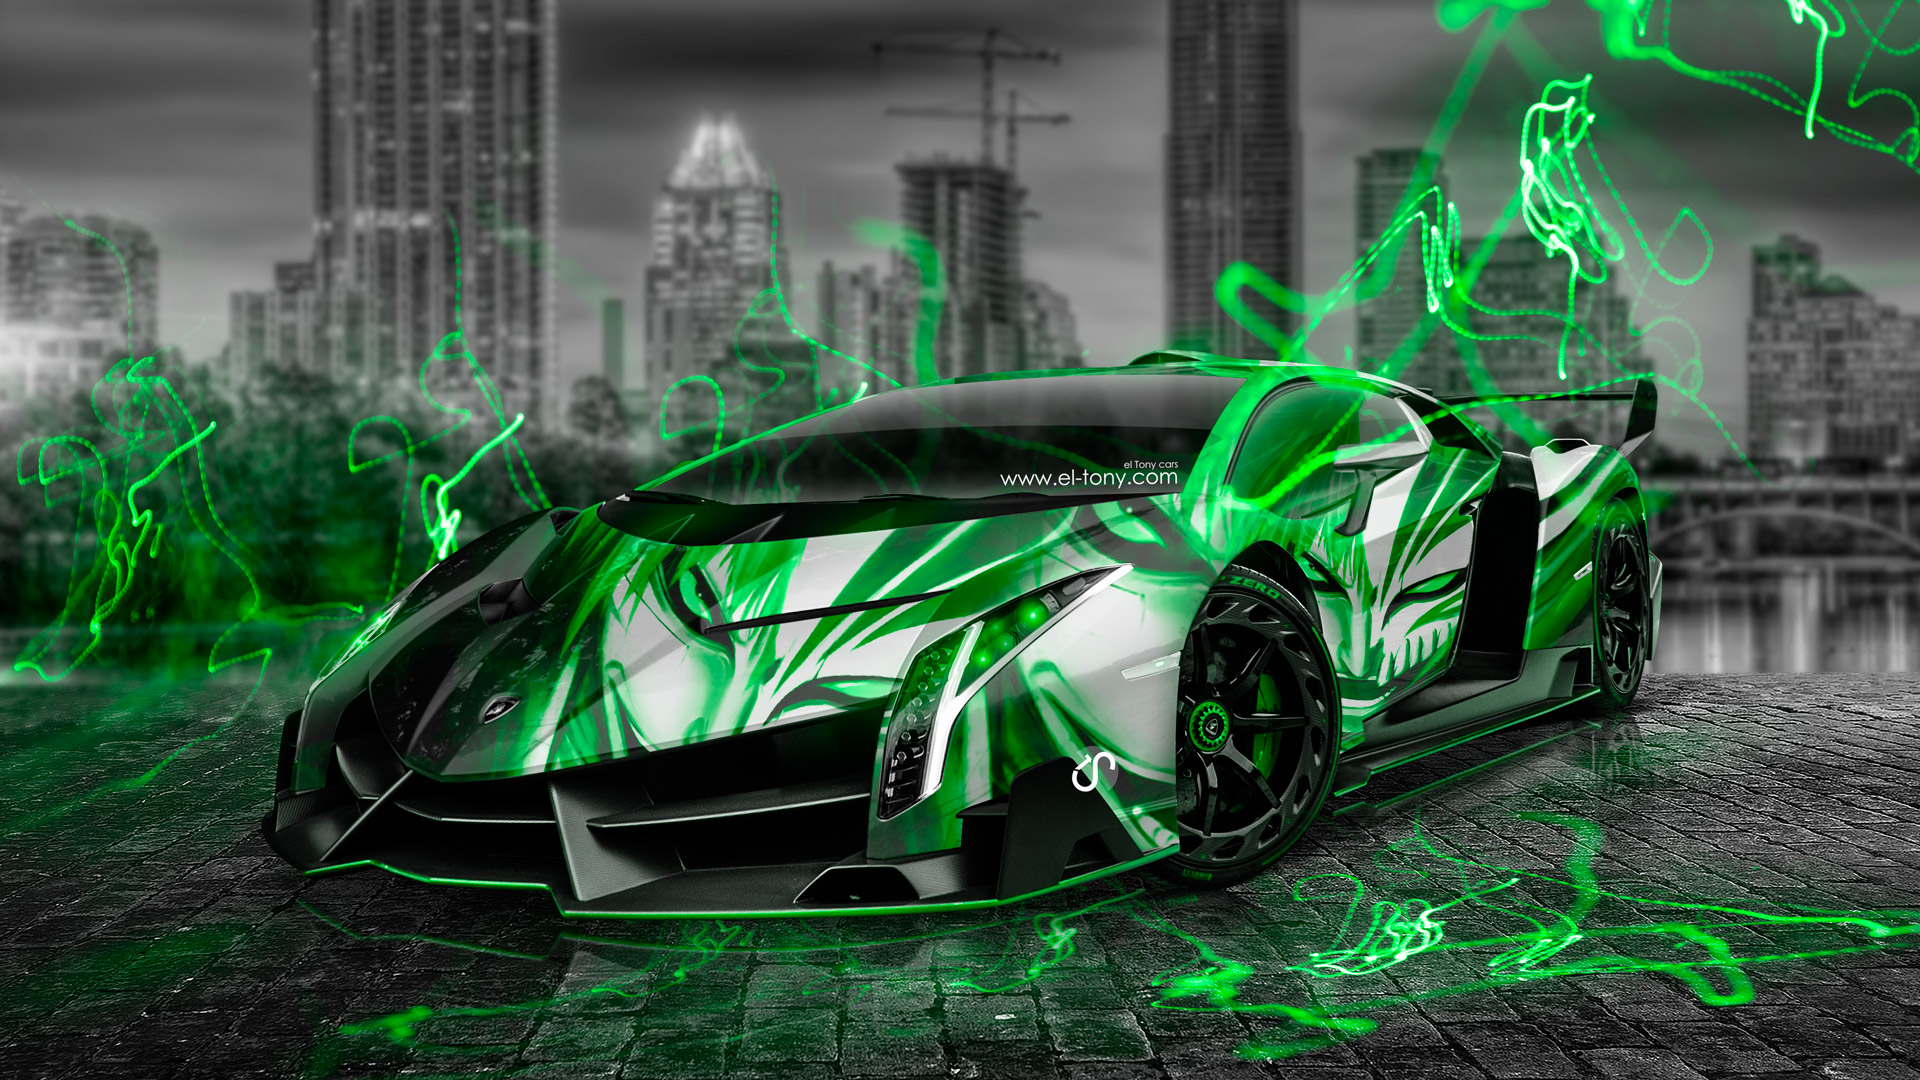 Lamborghini Veneno Anime Bleach Aerography City Car 2014 Green Neon ...